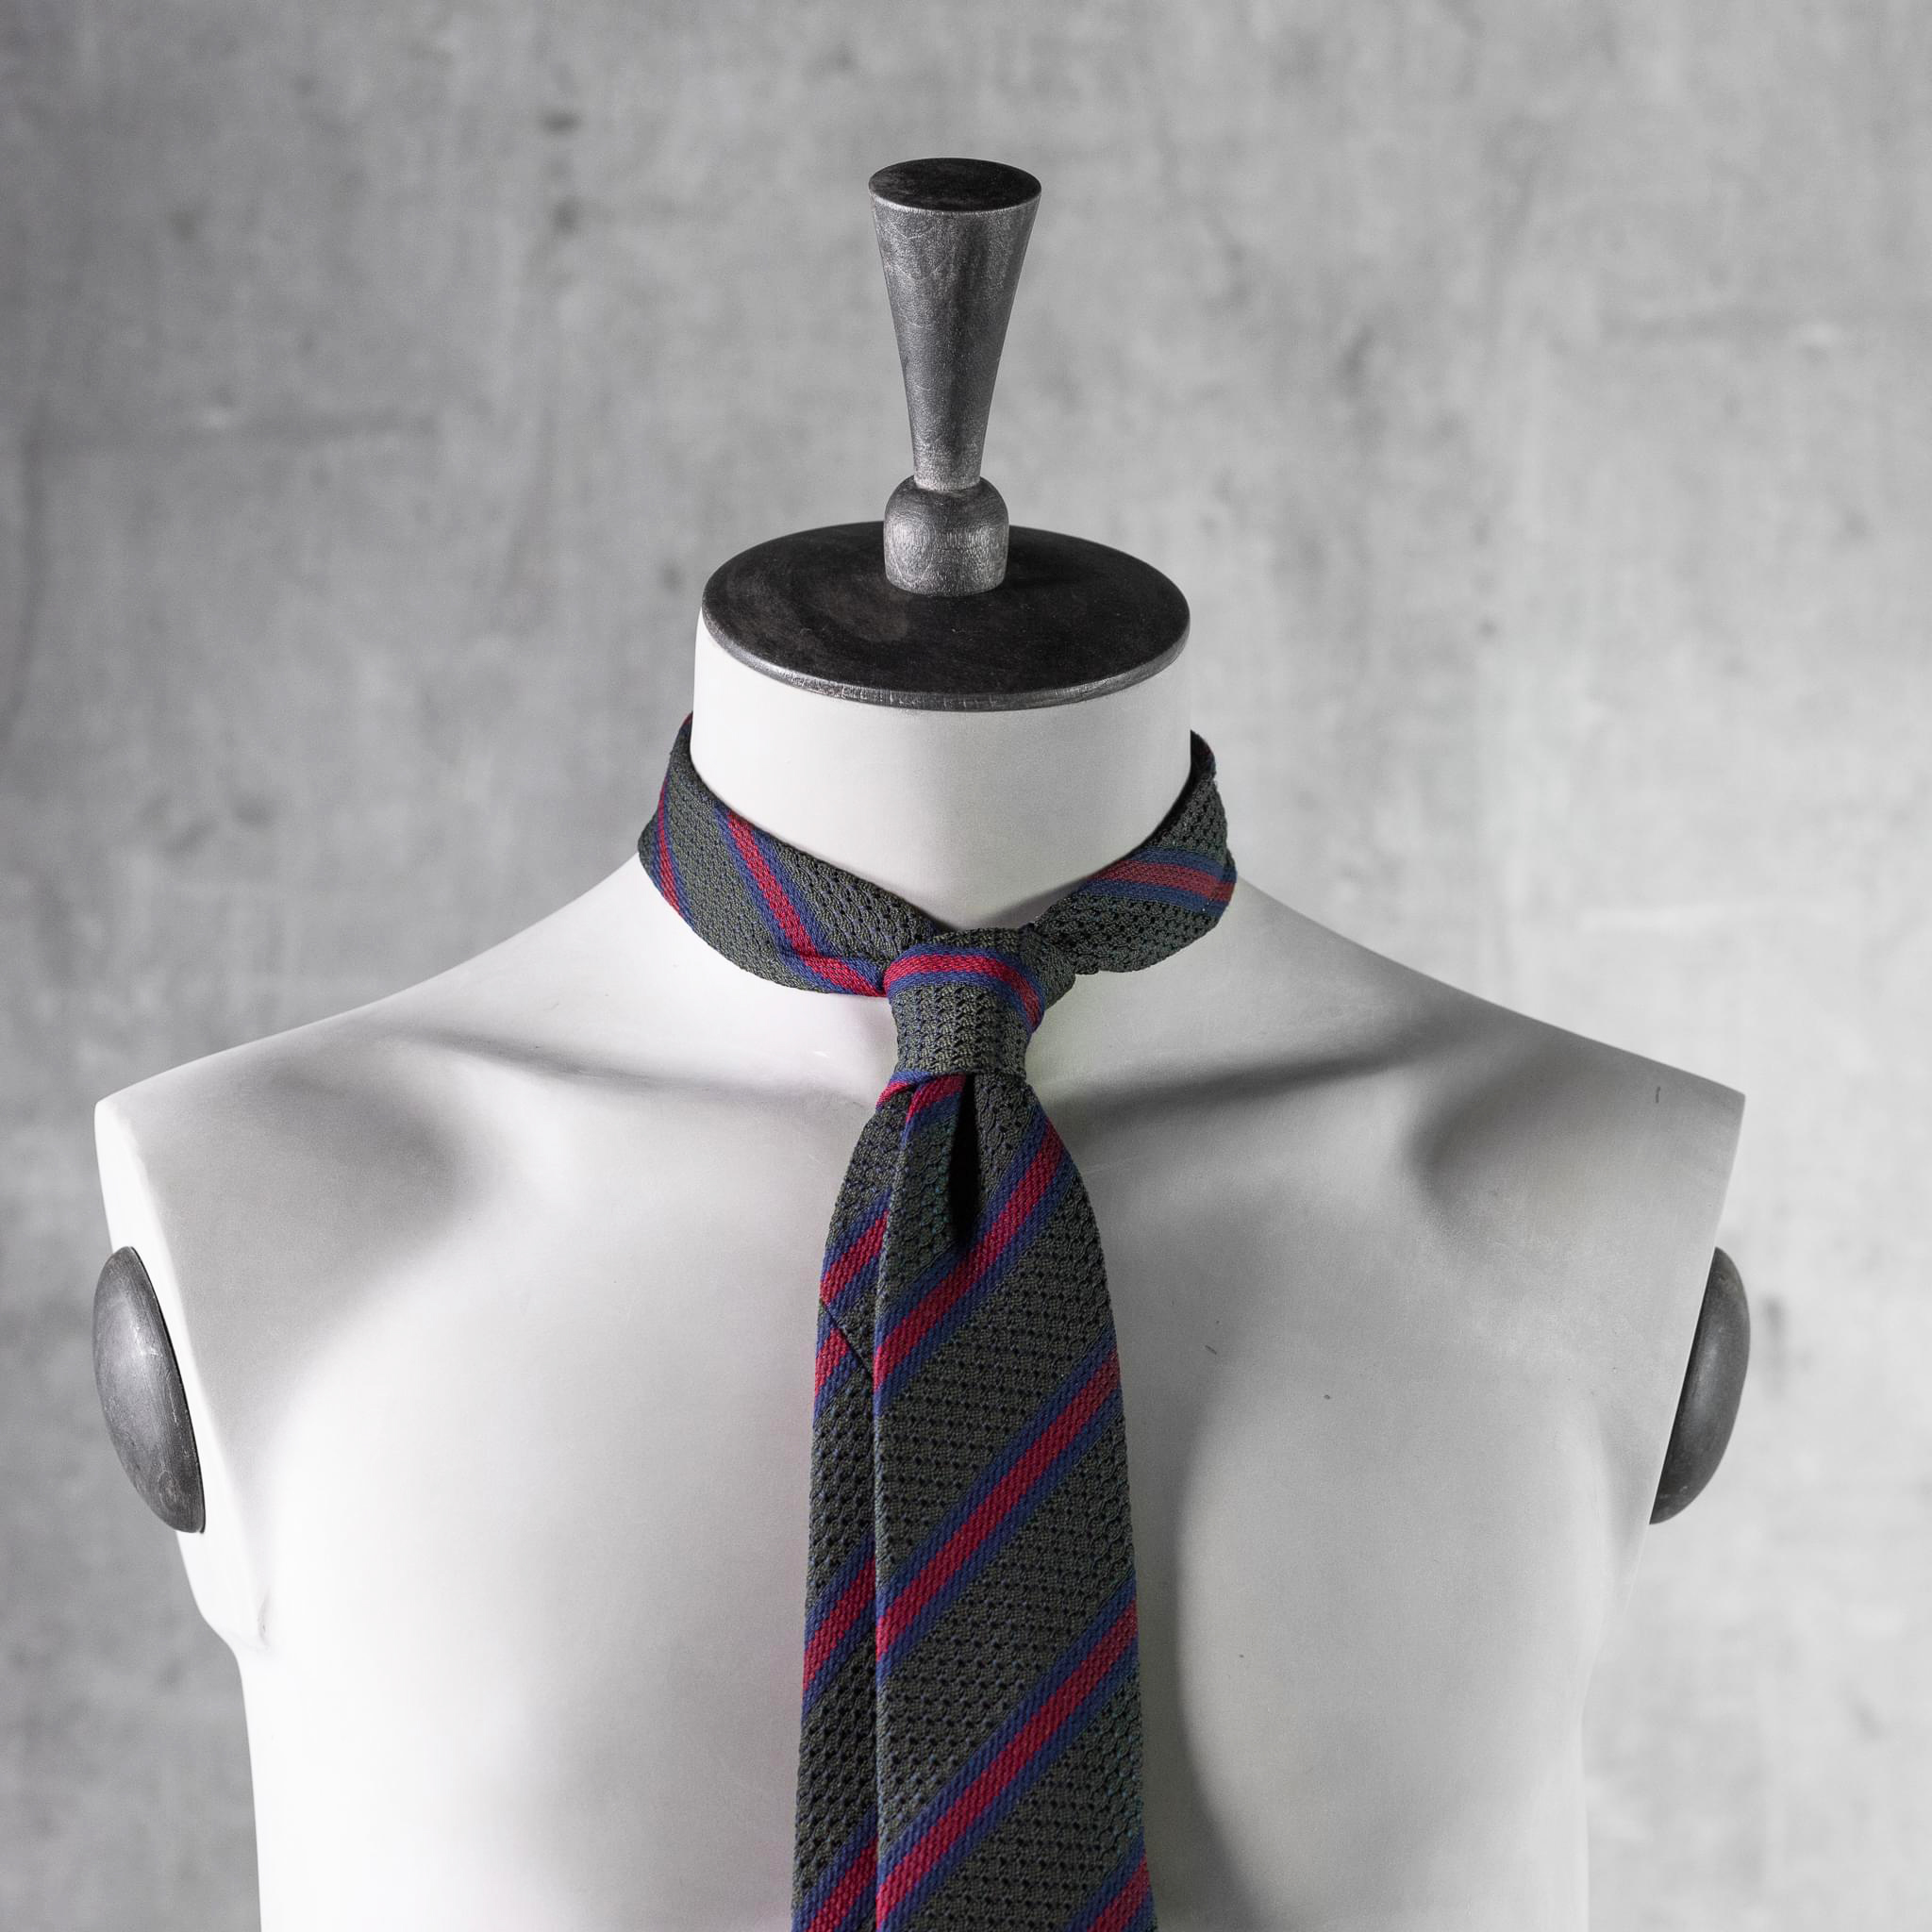 GRENADINE-0529-Tie-Initials-Corbata-Iniciales-The-Seelk-4